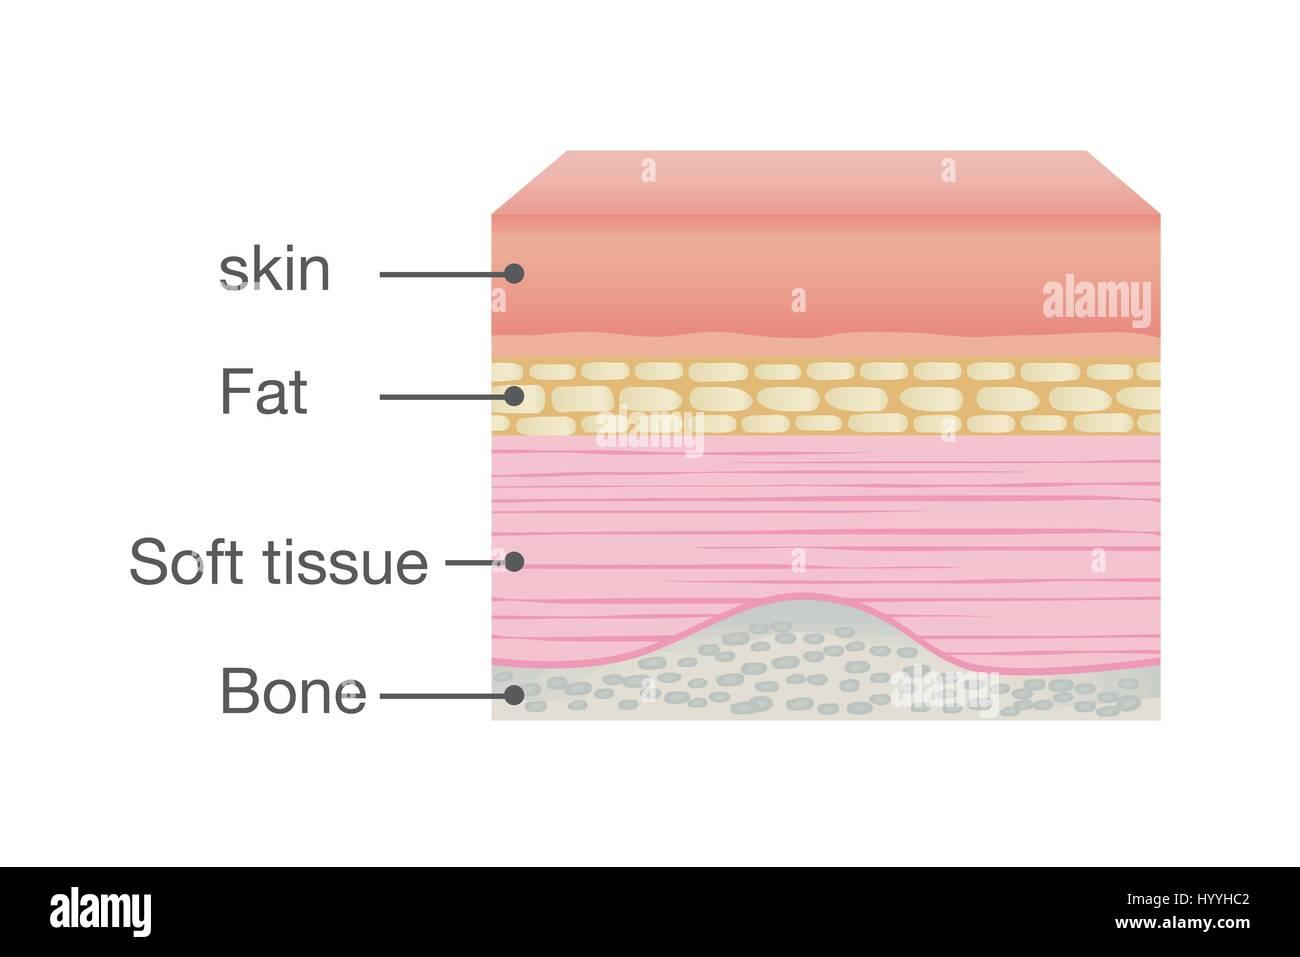 Human Skin Anatomy Diagram Stock Photos & Human Skin Anatomy Diagram ...